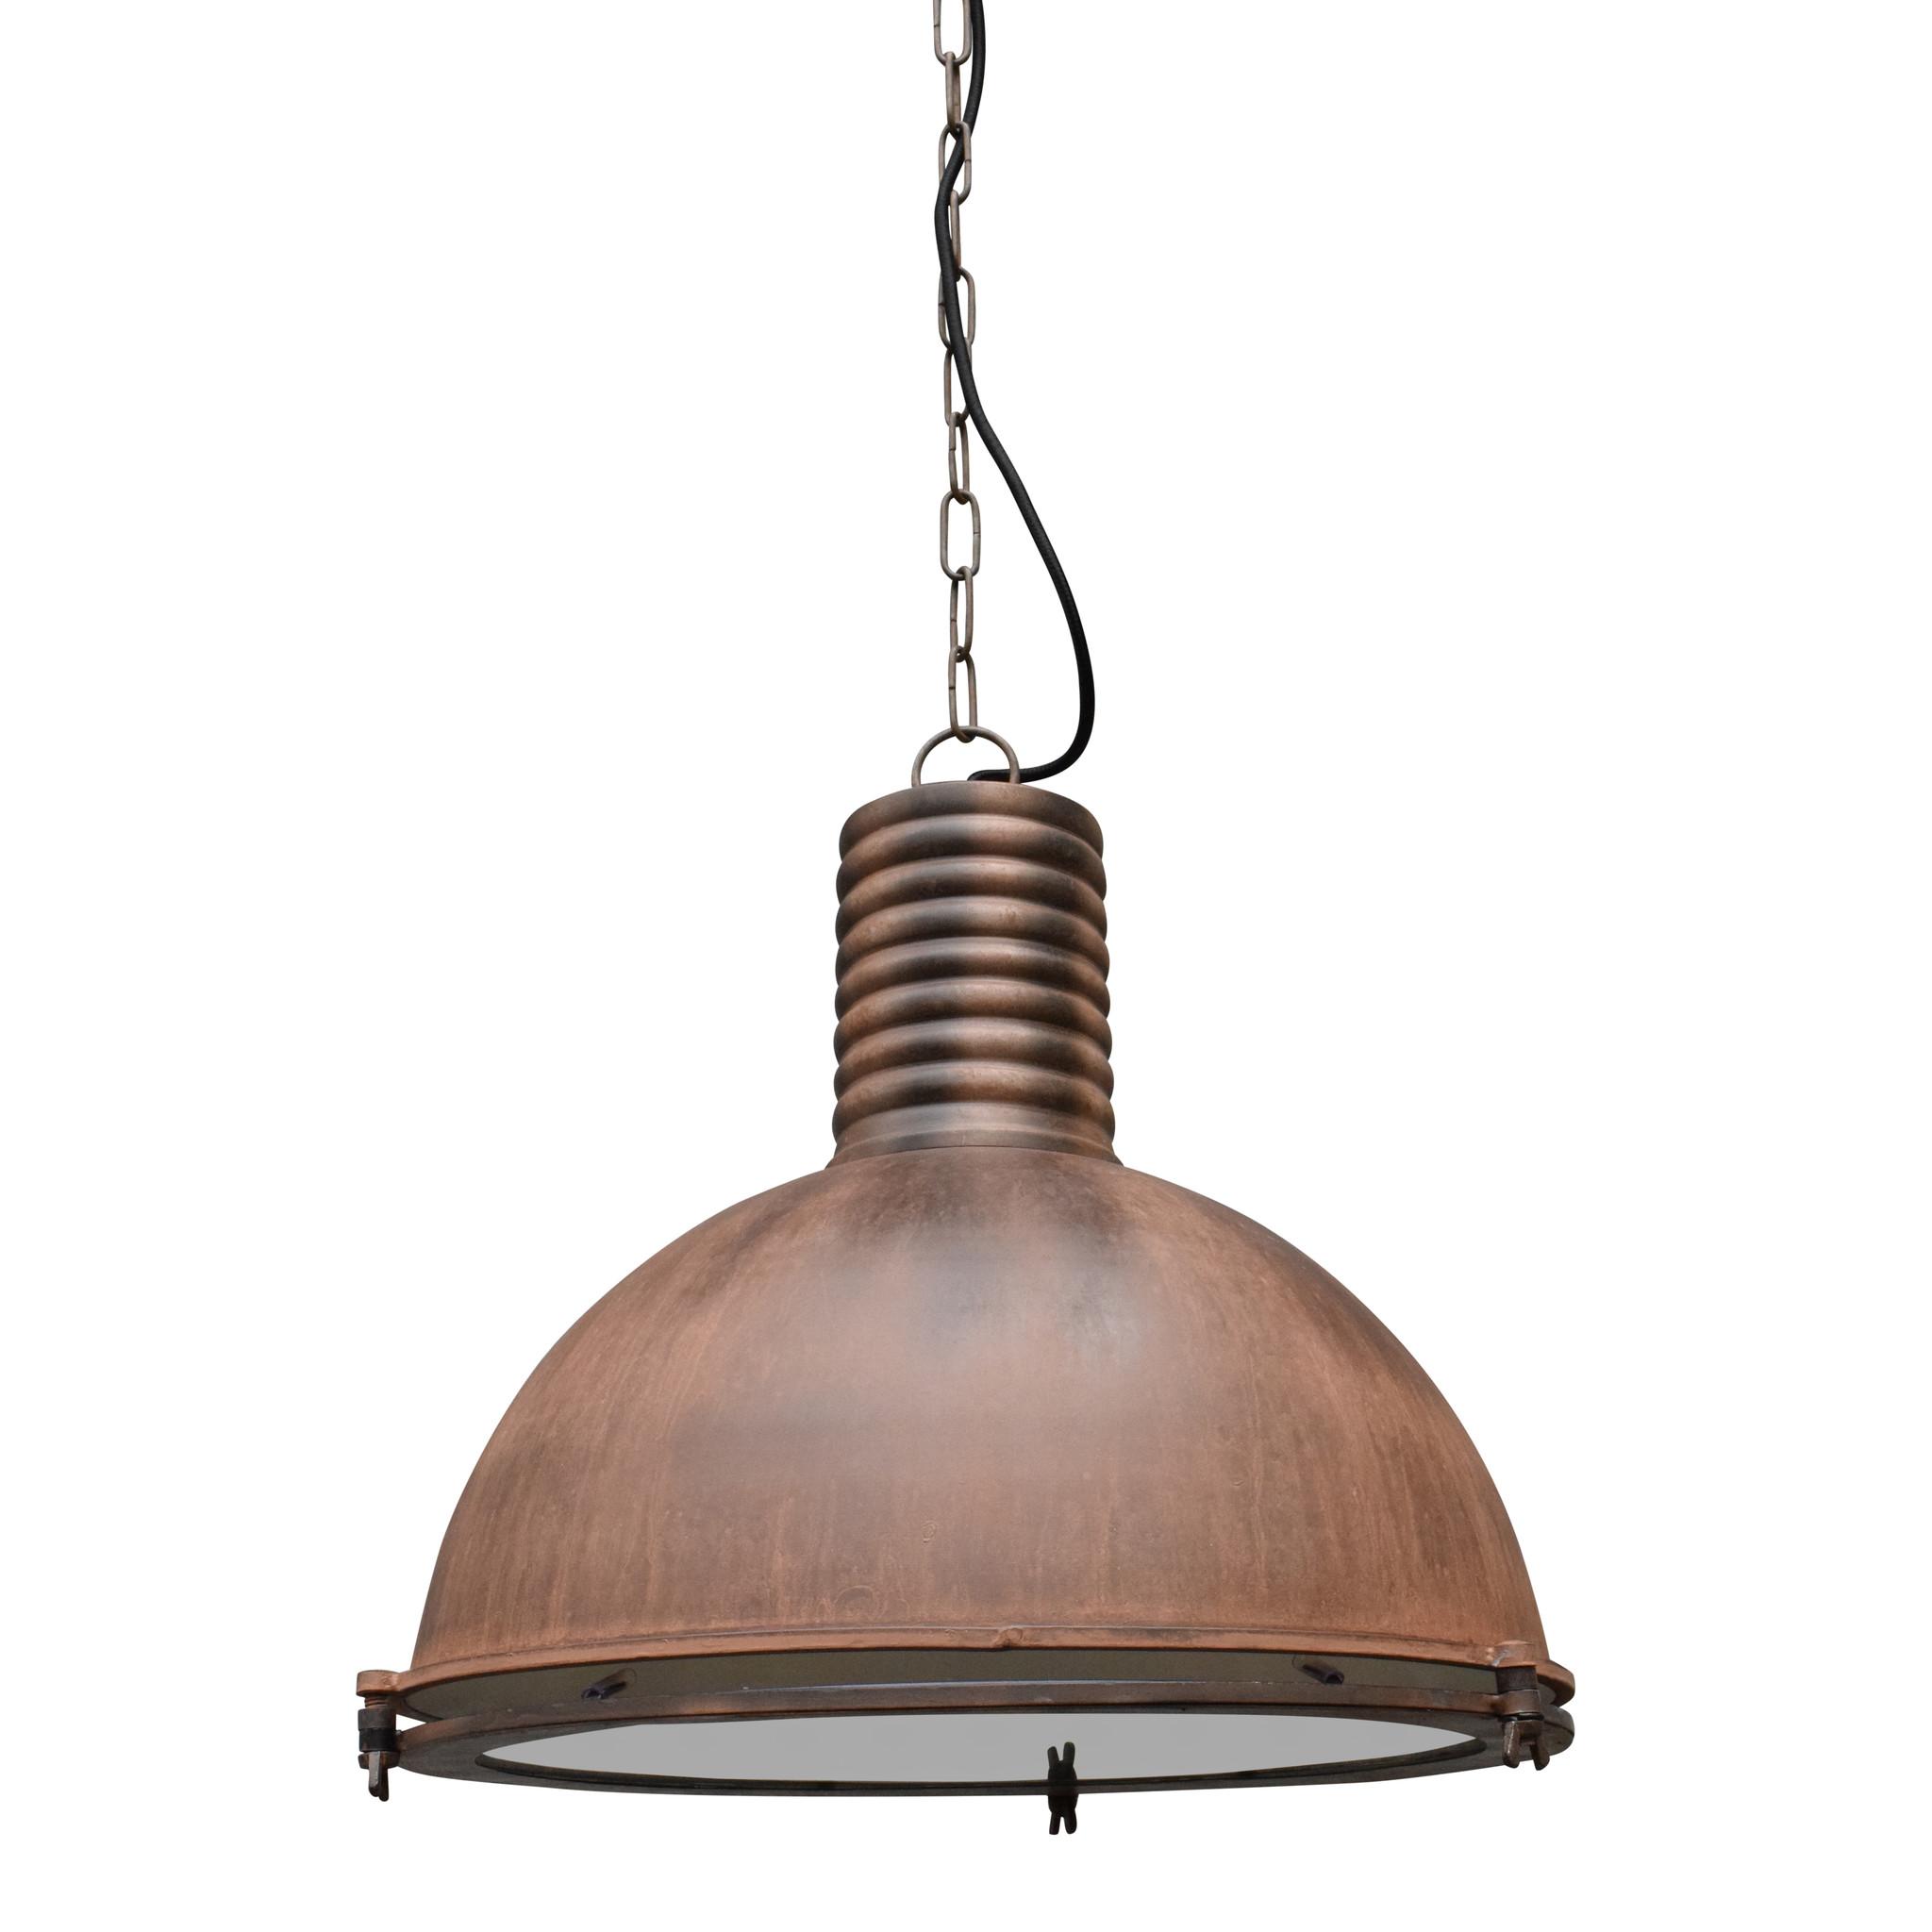 Urban Interiors Urban Interiors Hanglamp Vintage rusty ø40cm-AI-PL-226-BA-8719325005592